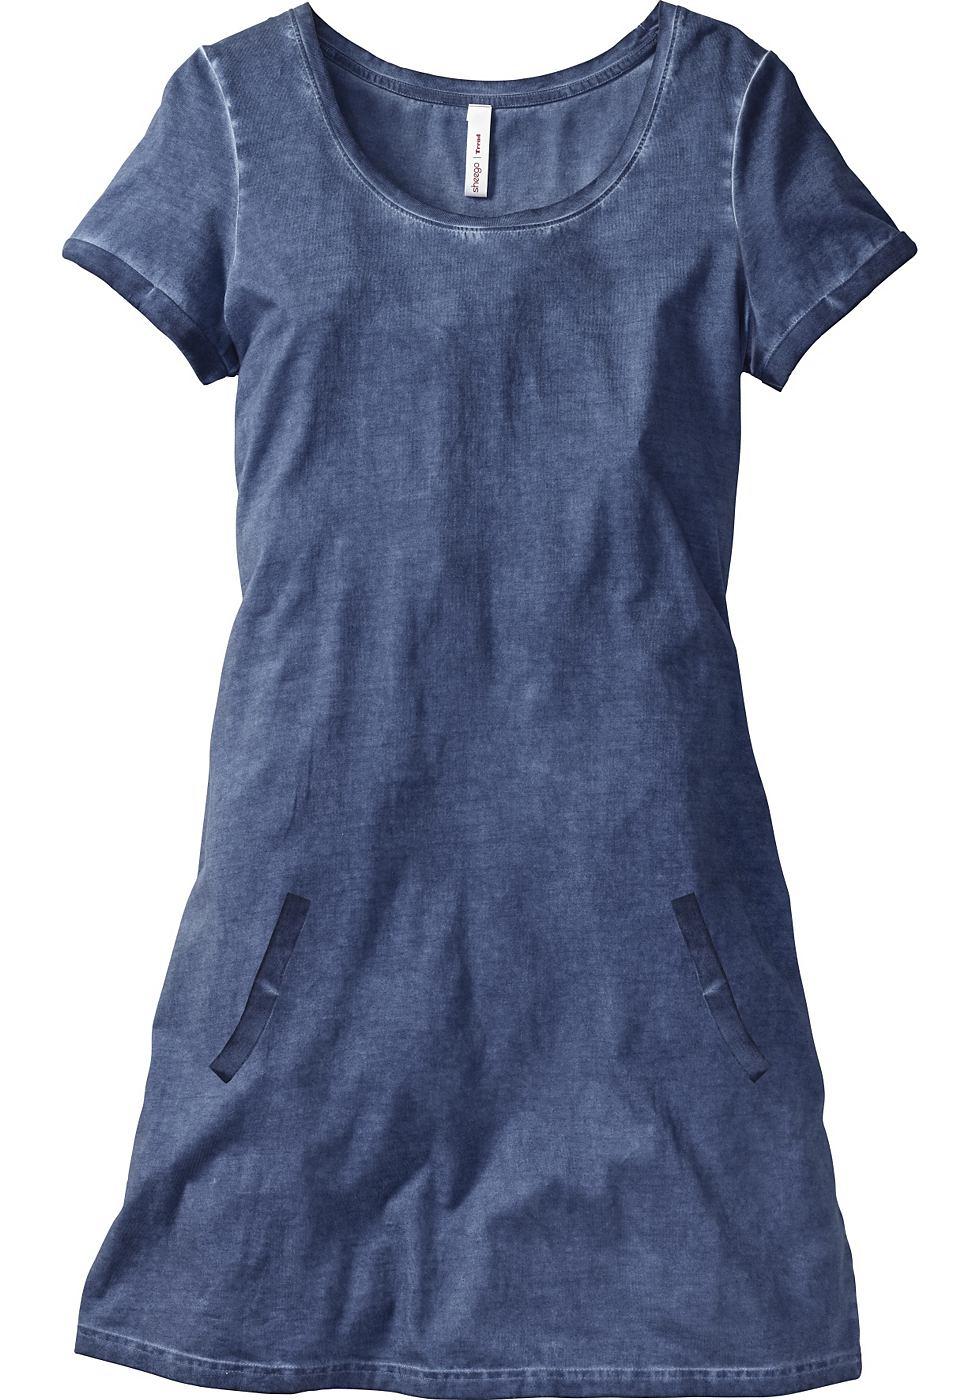 SHEEGO TREND eenvoudige shirtjurk blauw